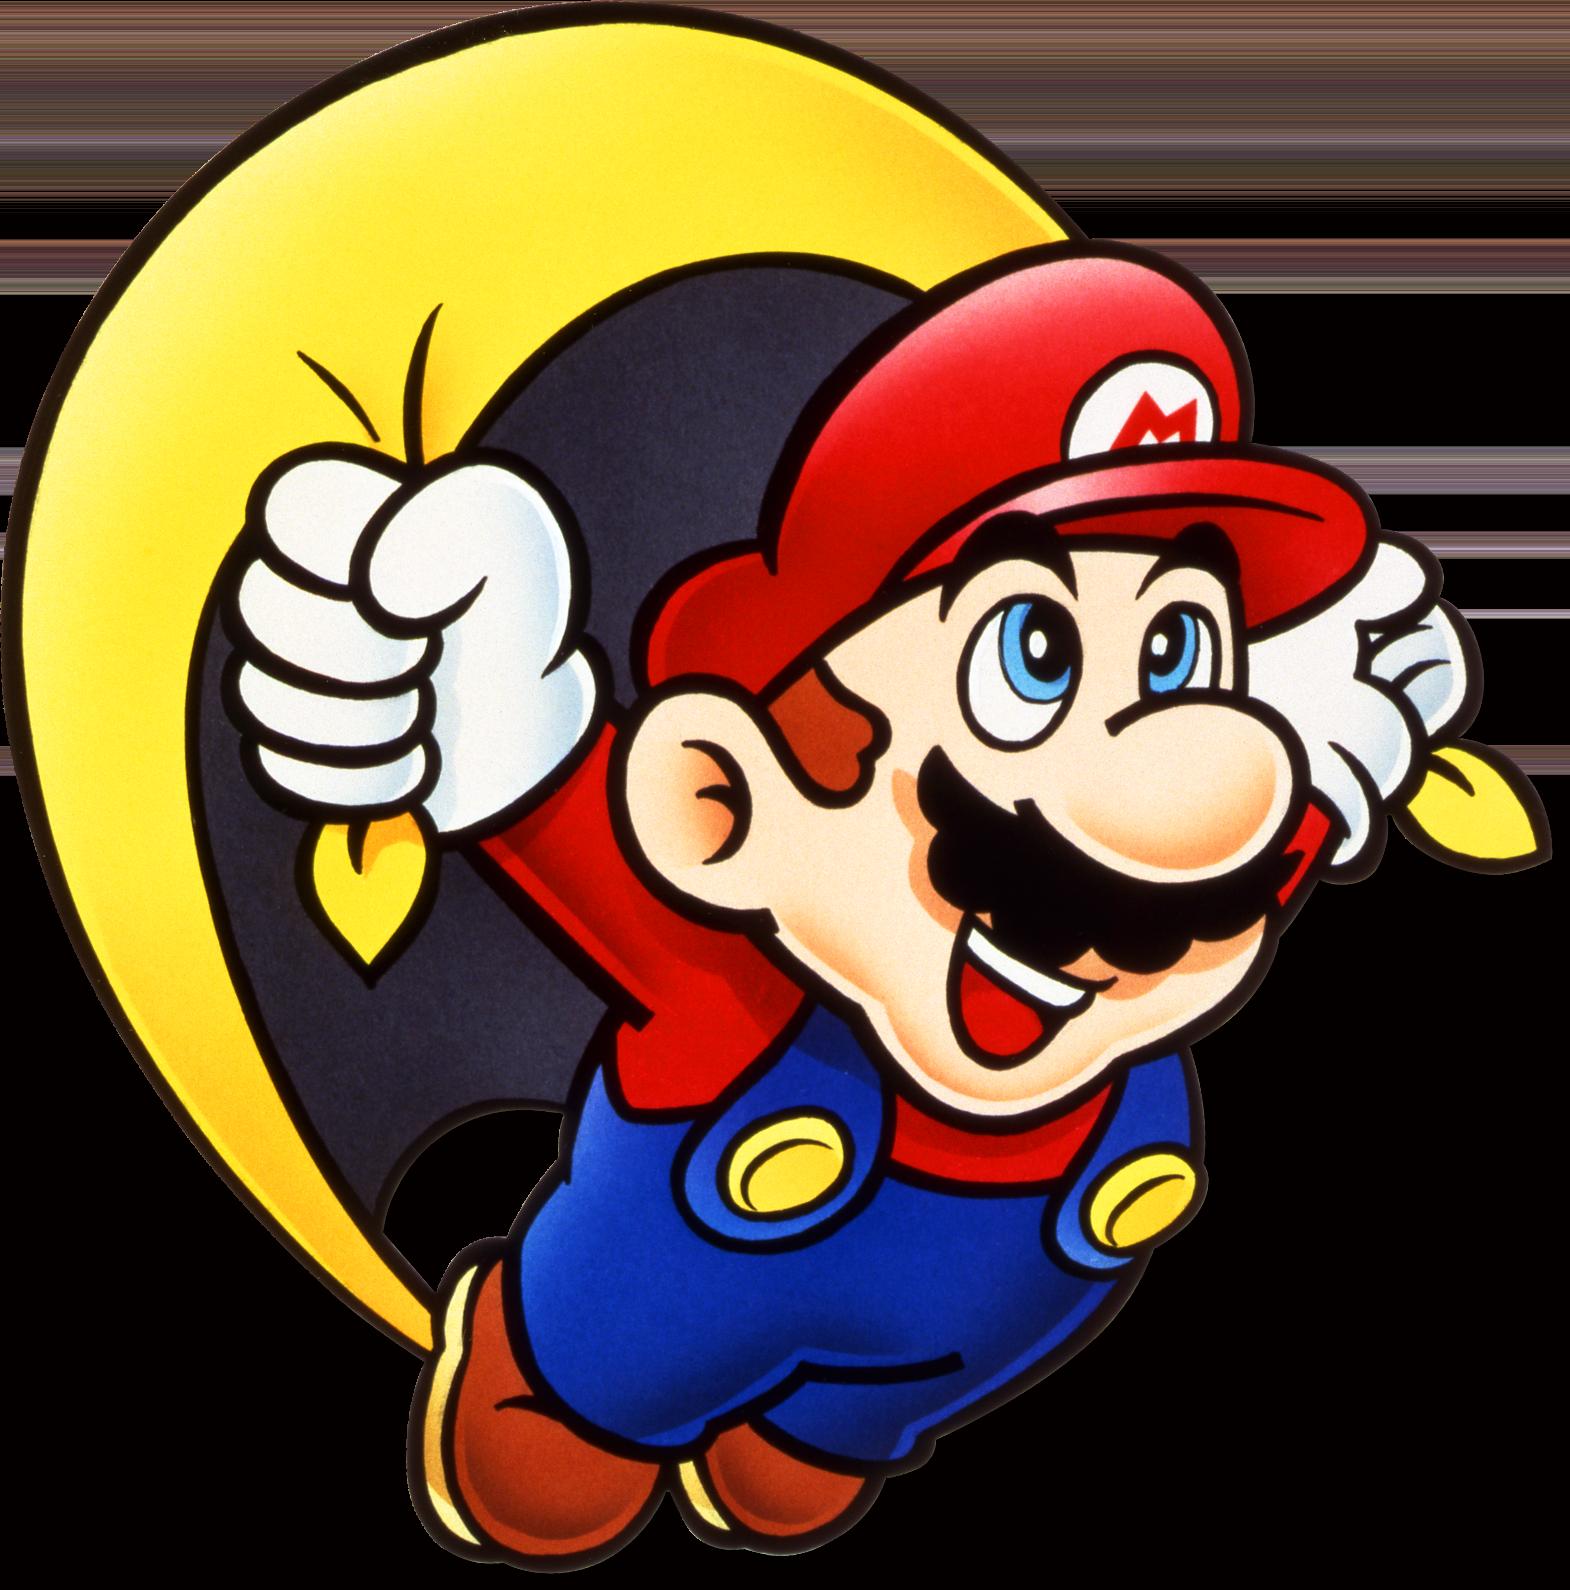 Cape Mario 20 Reasons Why Super Mario World Has Aged Better Than Super Mario Bros. 3